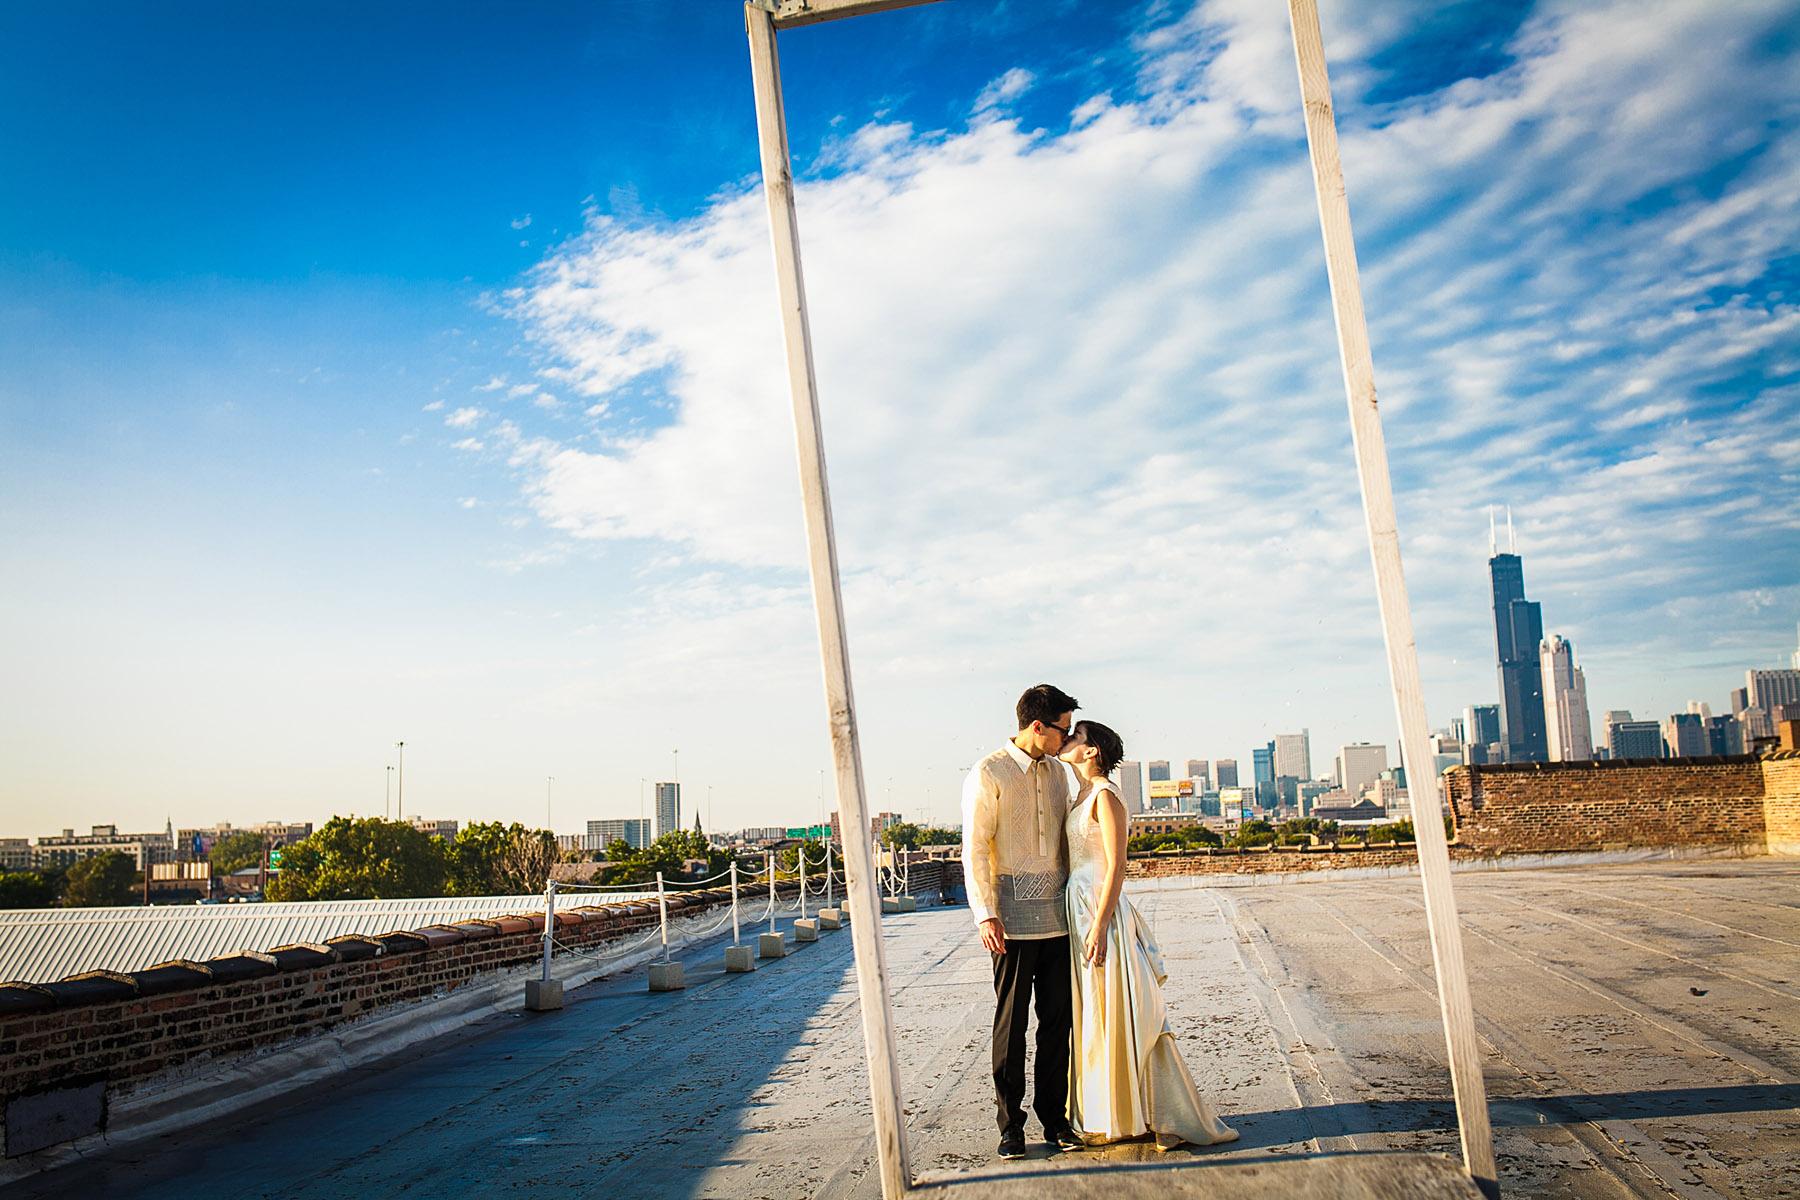 st-hegwig-chicago-urban-arts-society-terrarium-inspired-wedding-documentary-wedding-photography-oriana-koren-54.jpg